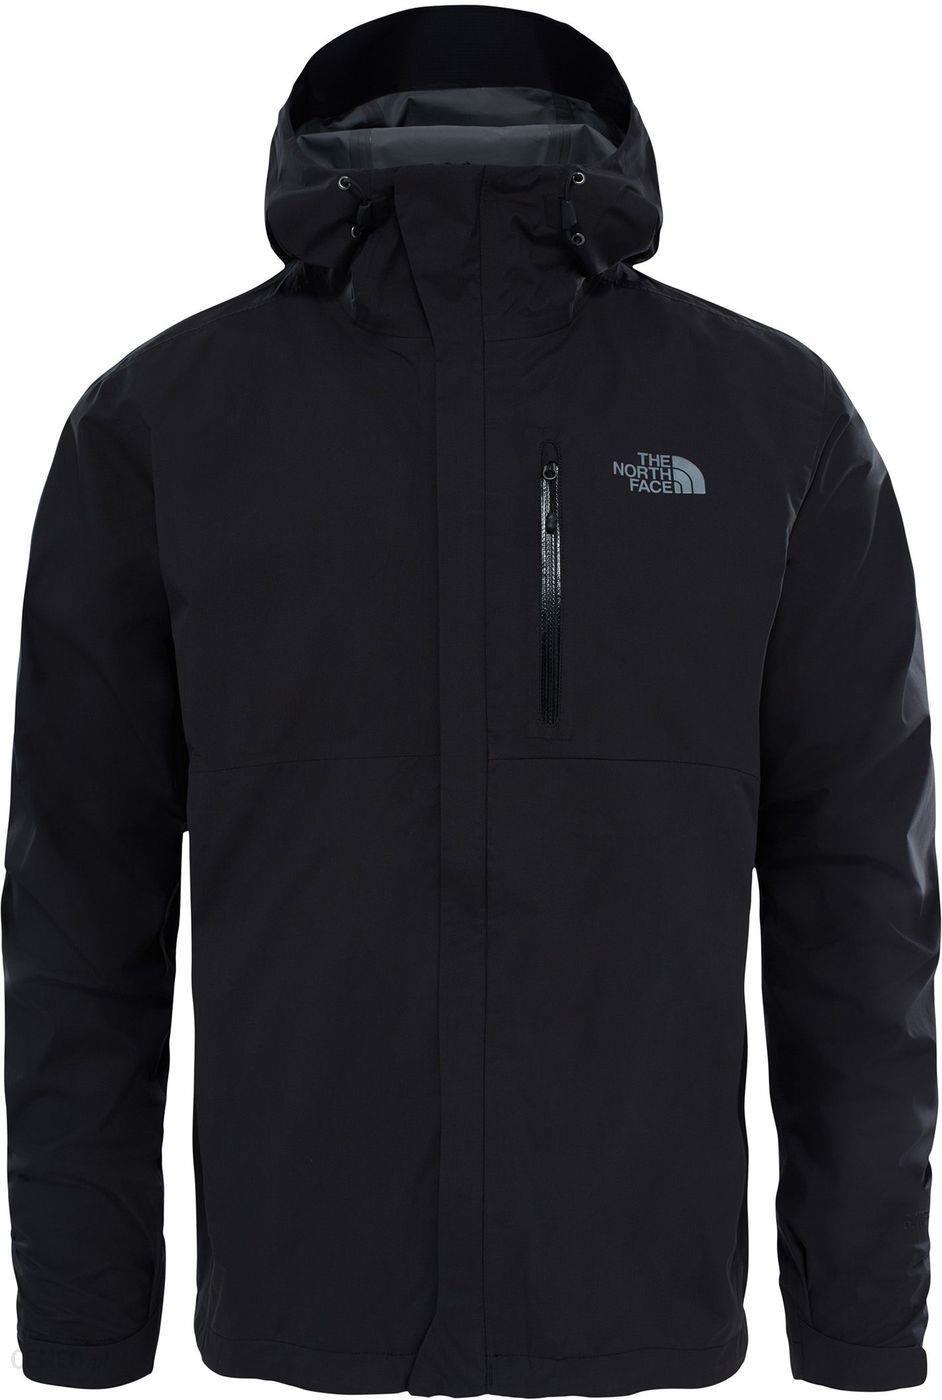 cbcca9fc94ea91 ... uk the north face dryzzle jacket gore tex t92ve8jk3 zdjcie 1 57a3e ccccd